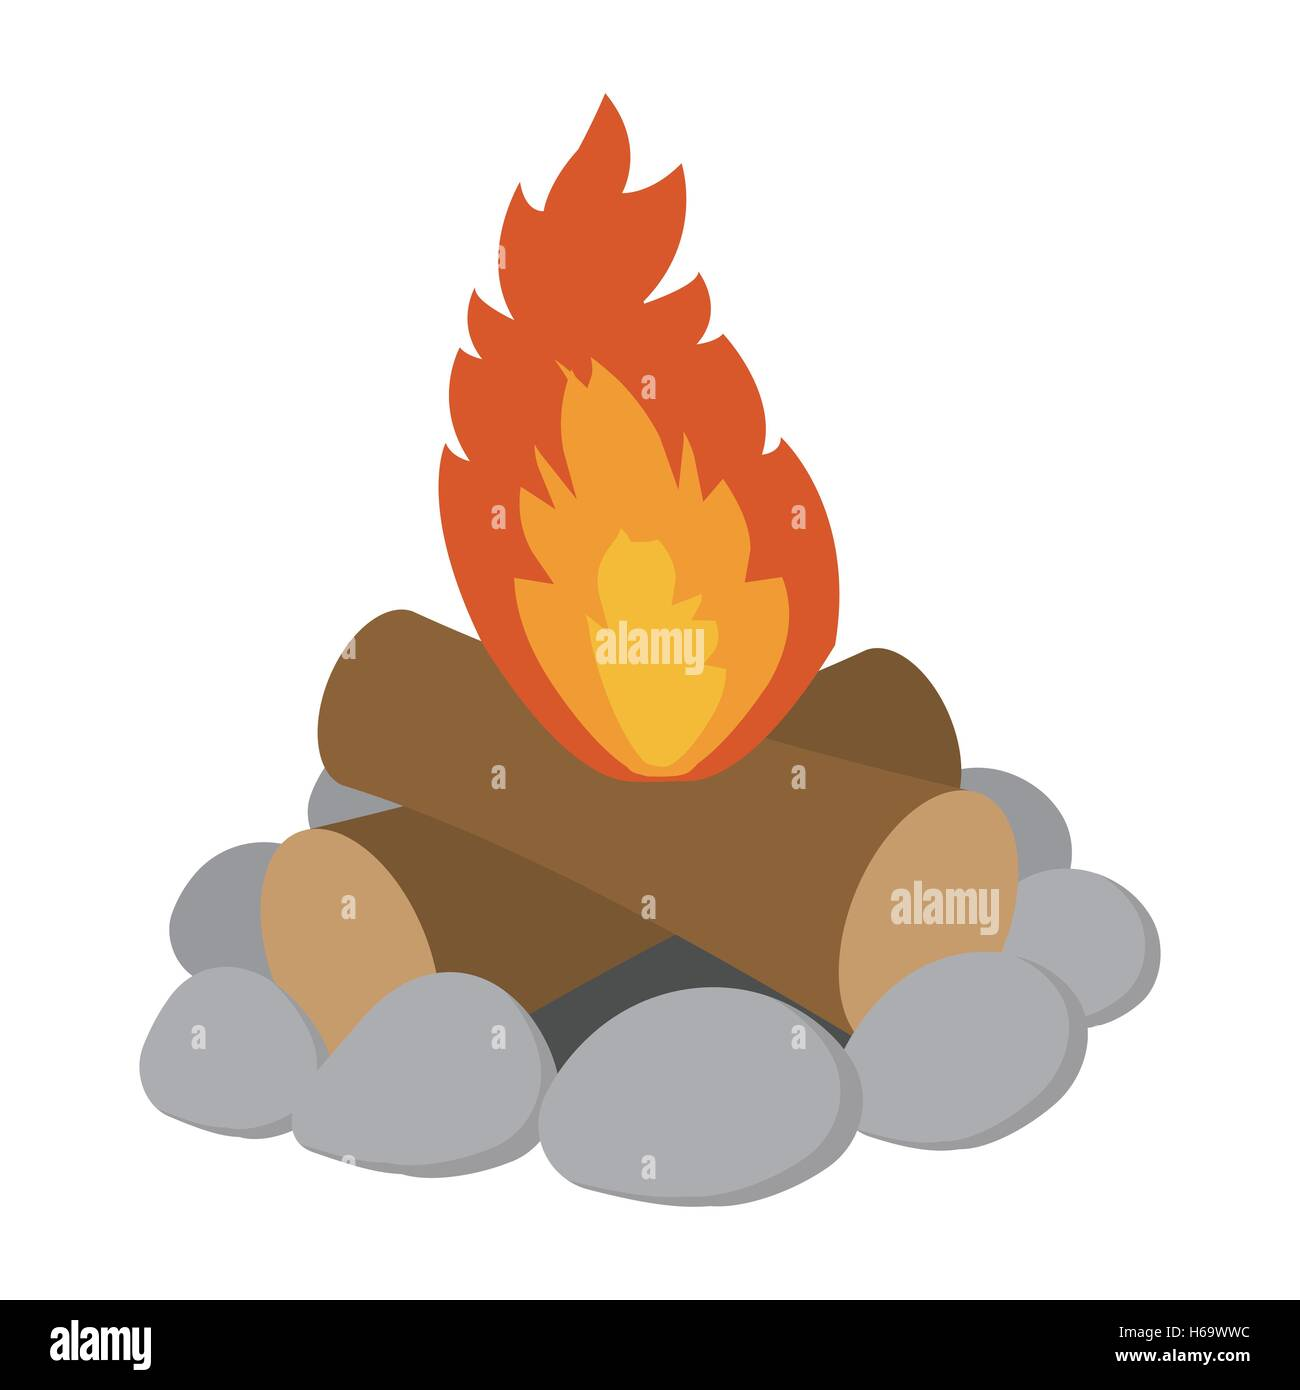 campfire cartoon icon stock vector art illustration vector image rh alamy com campfire cartoon images campfire cartoon gif